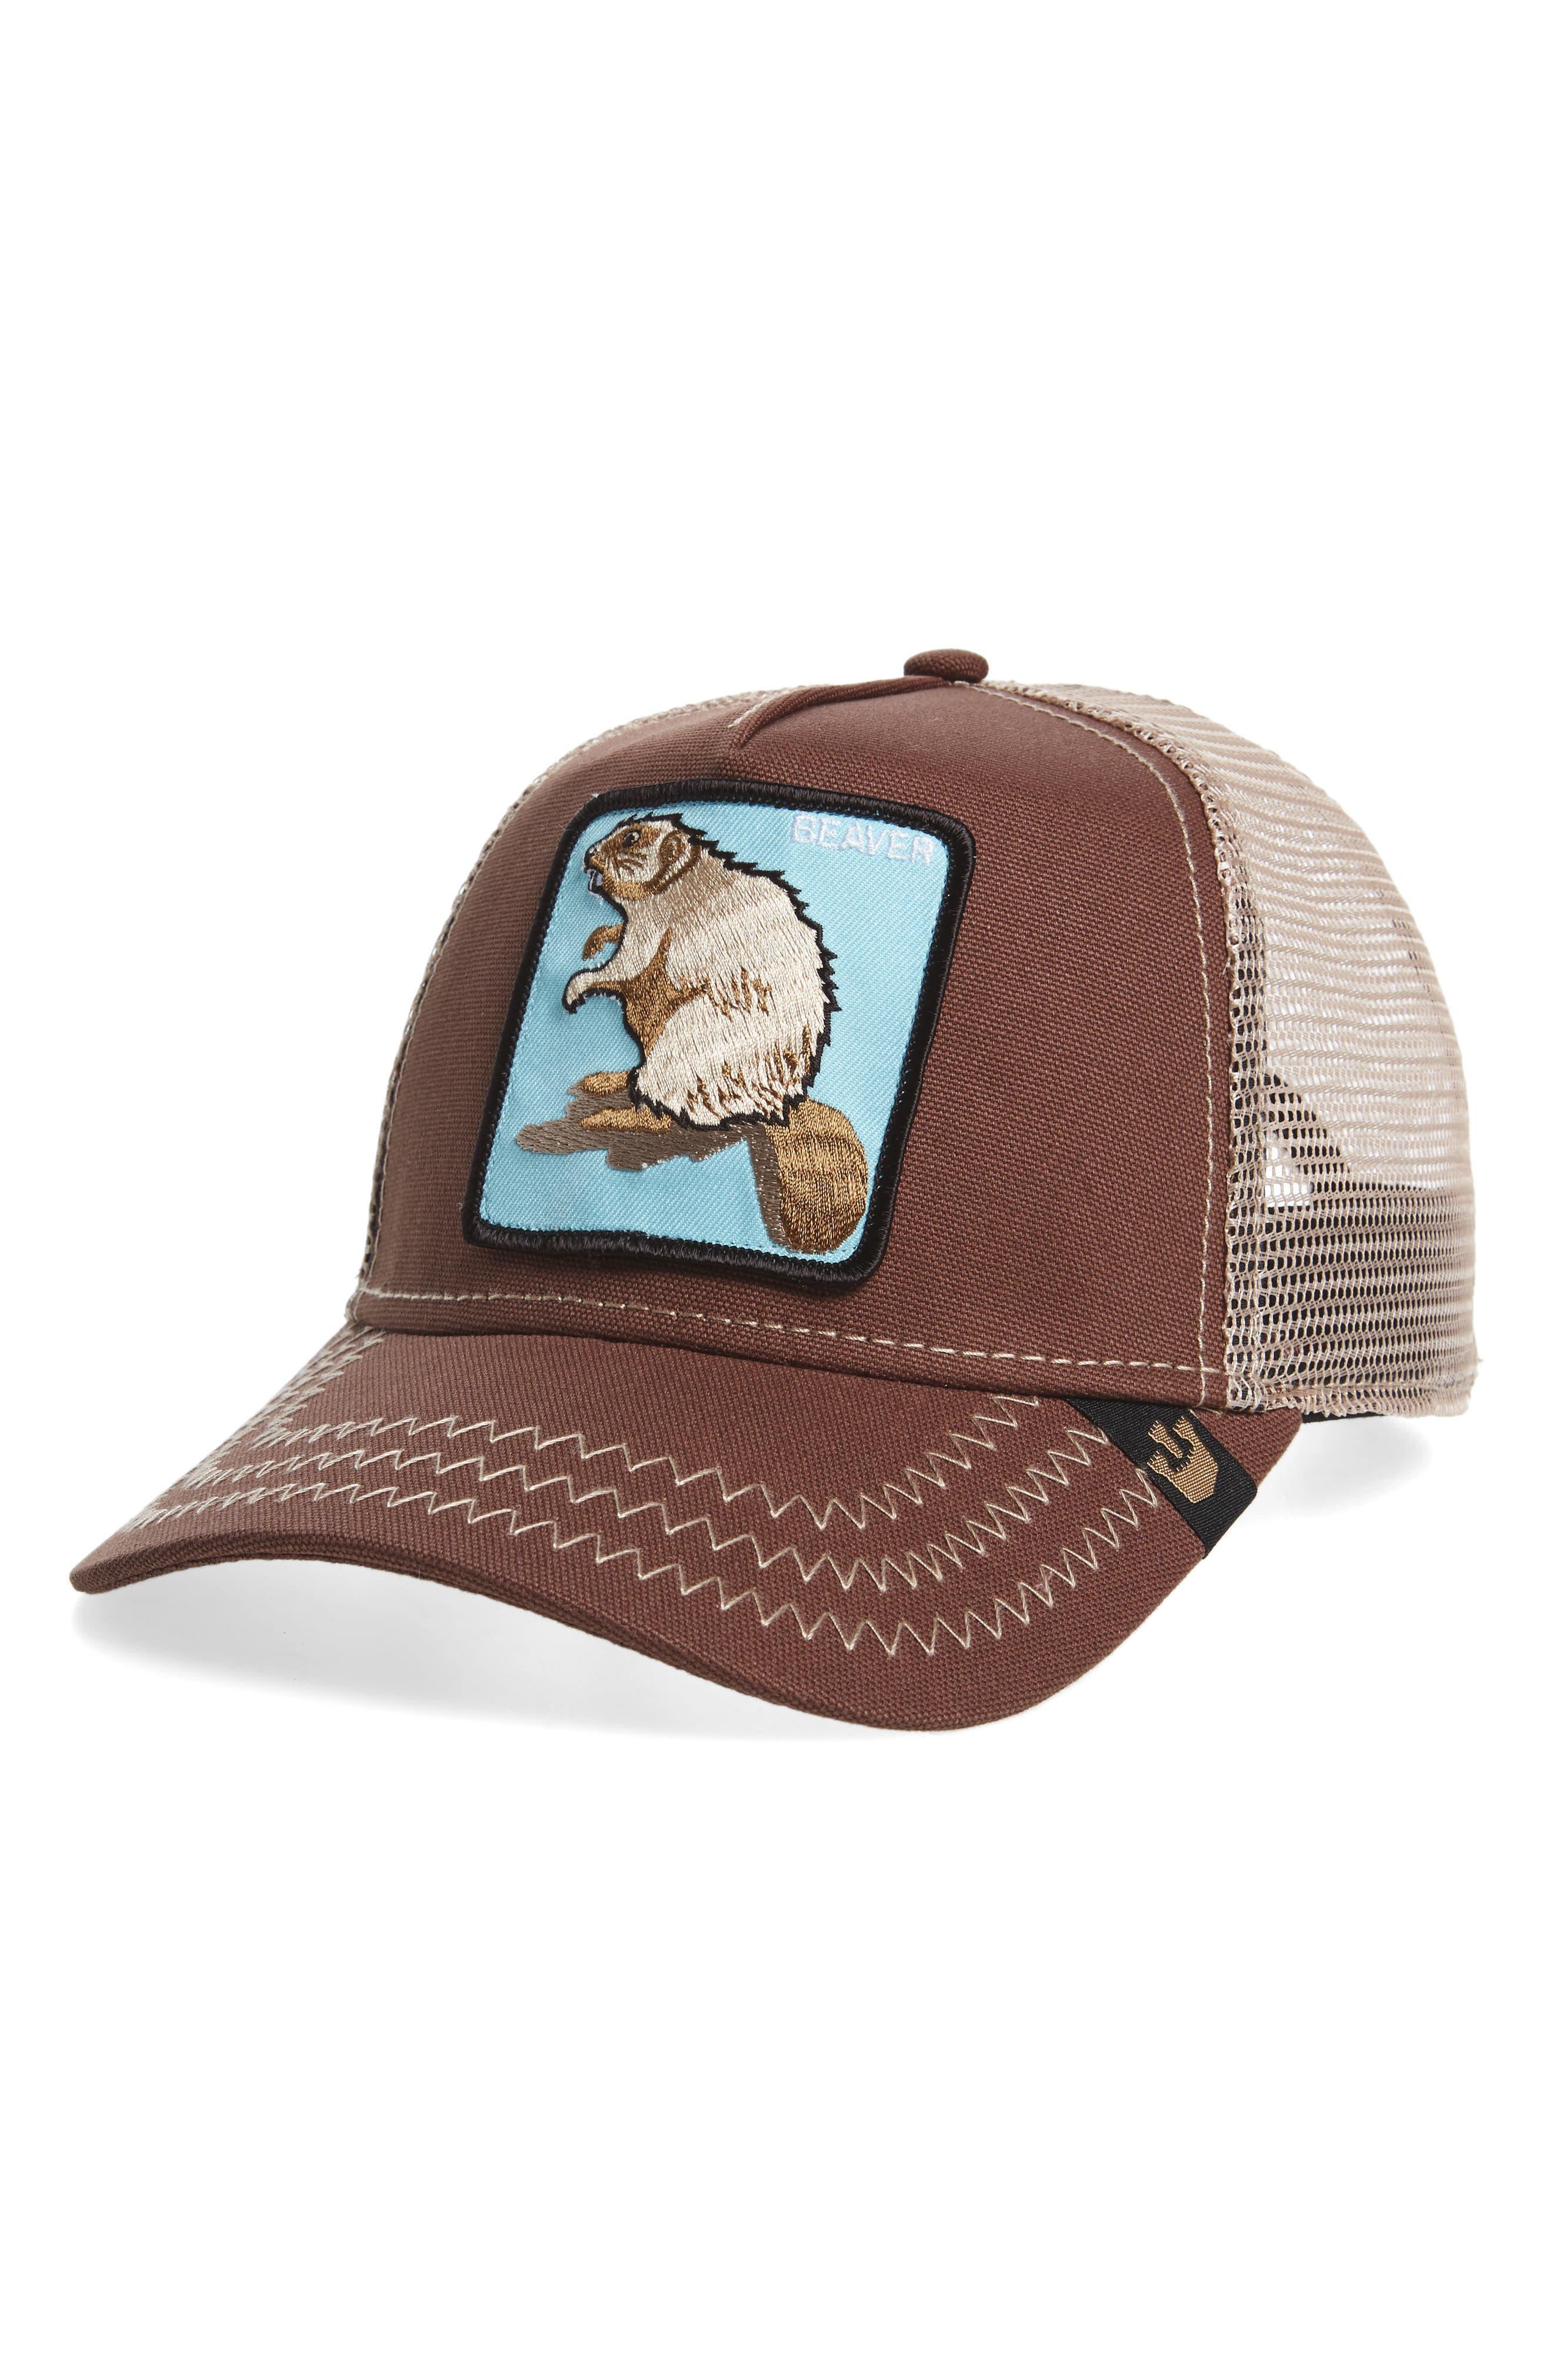 Goorin Brothers Animal Farm Beaver Mesh Trucker Hat